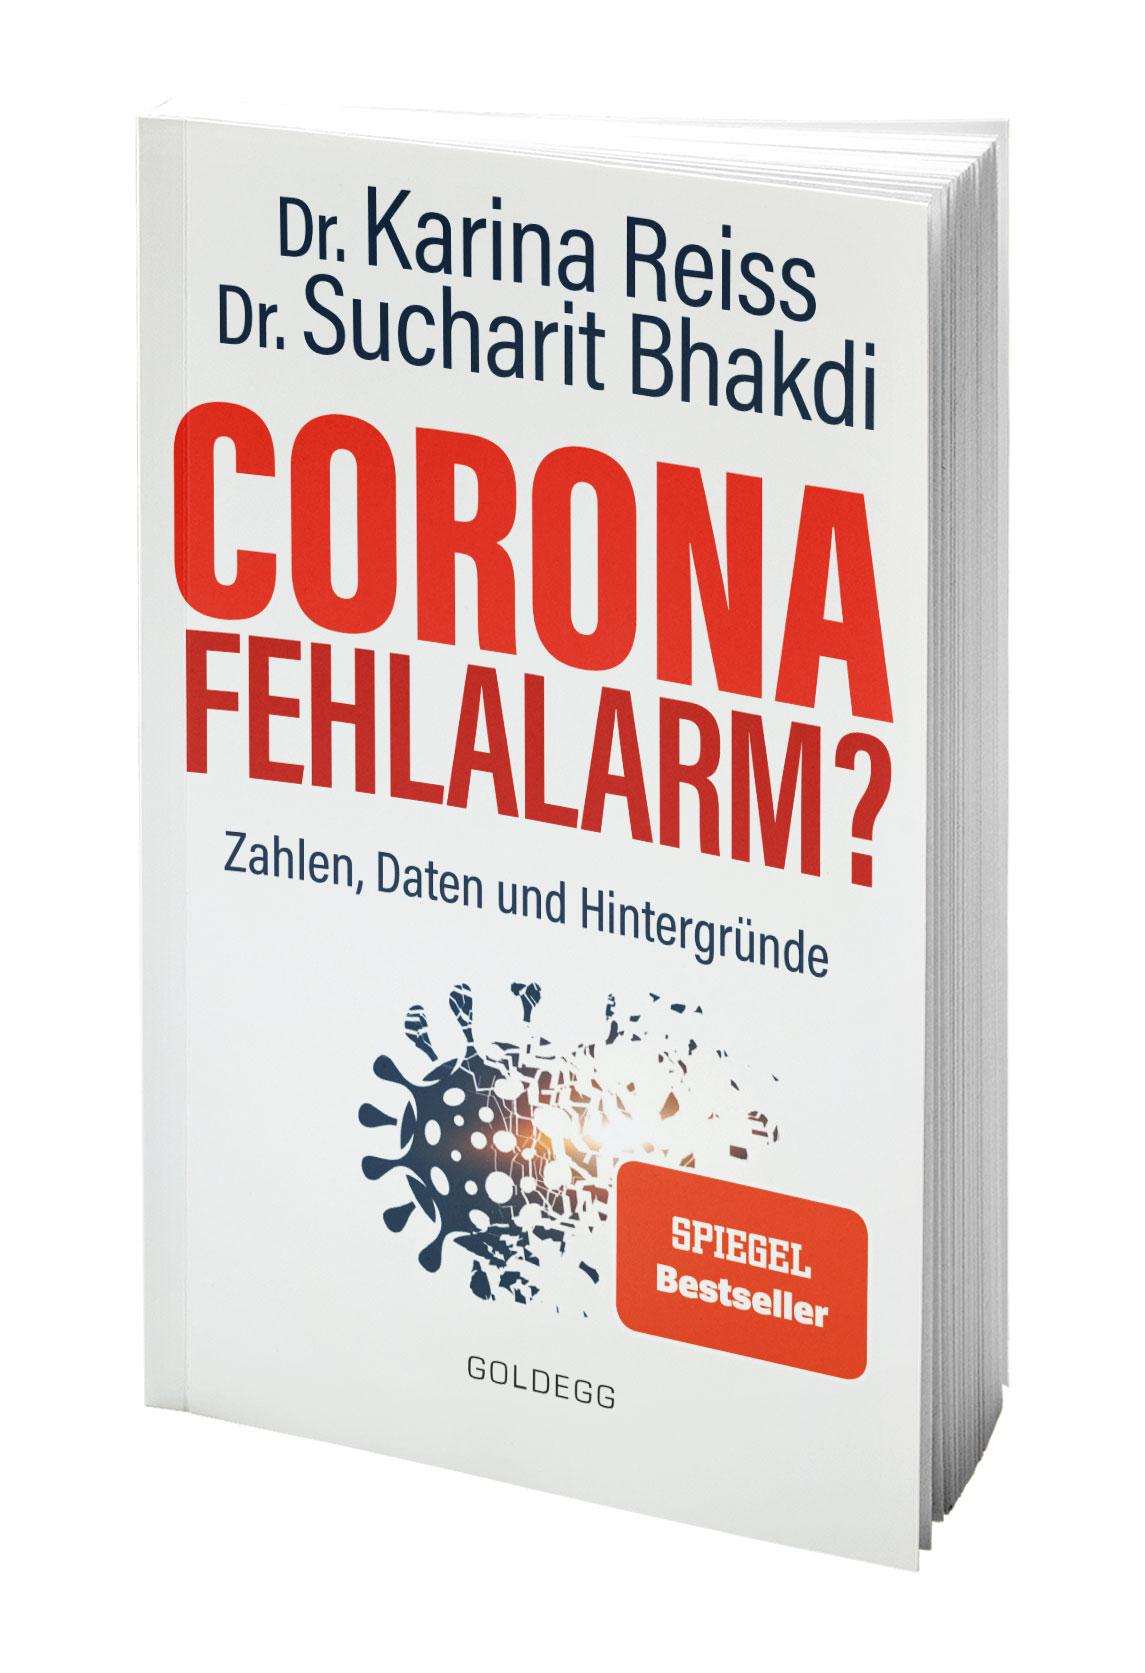 Corona Fehlalarm? - Goldegg Verlag